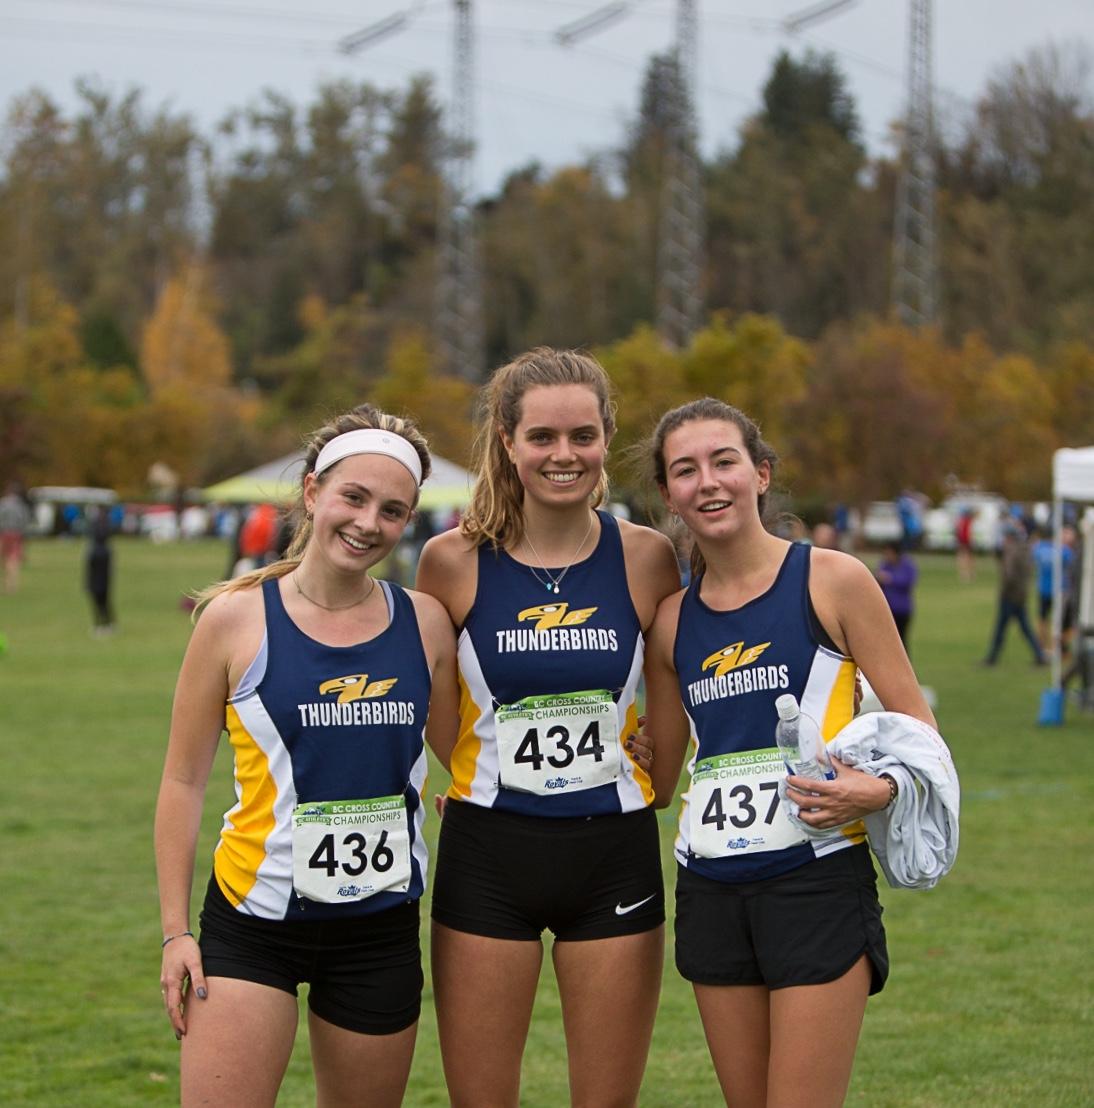 Thunderbird Intermediate Endurance Athletes: Olivia Uliana, Emily MacGowan, and Taylor Williams.